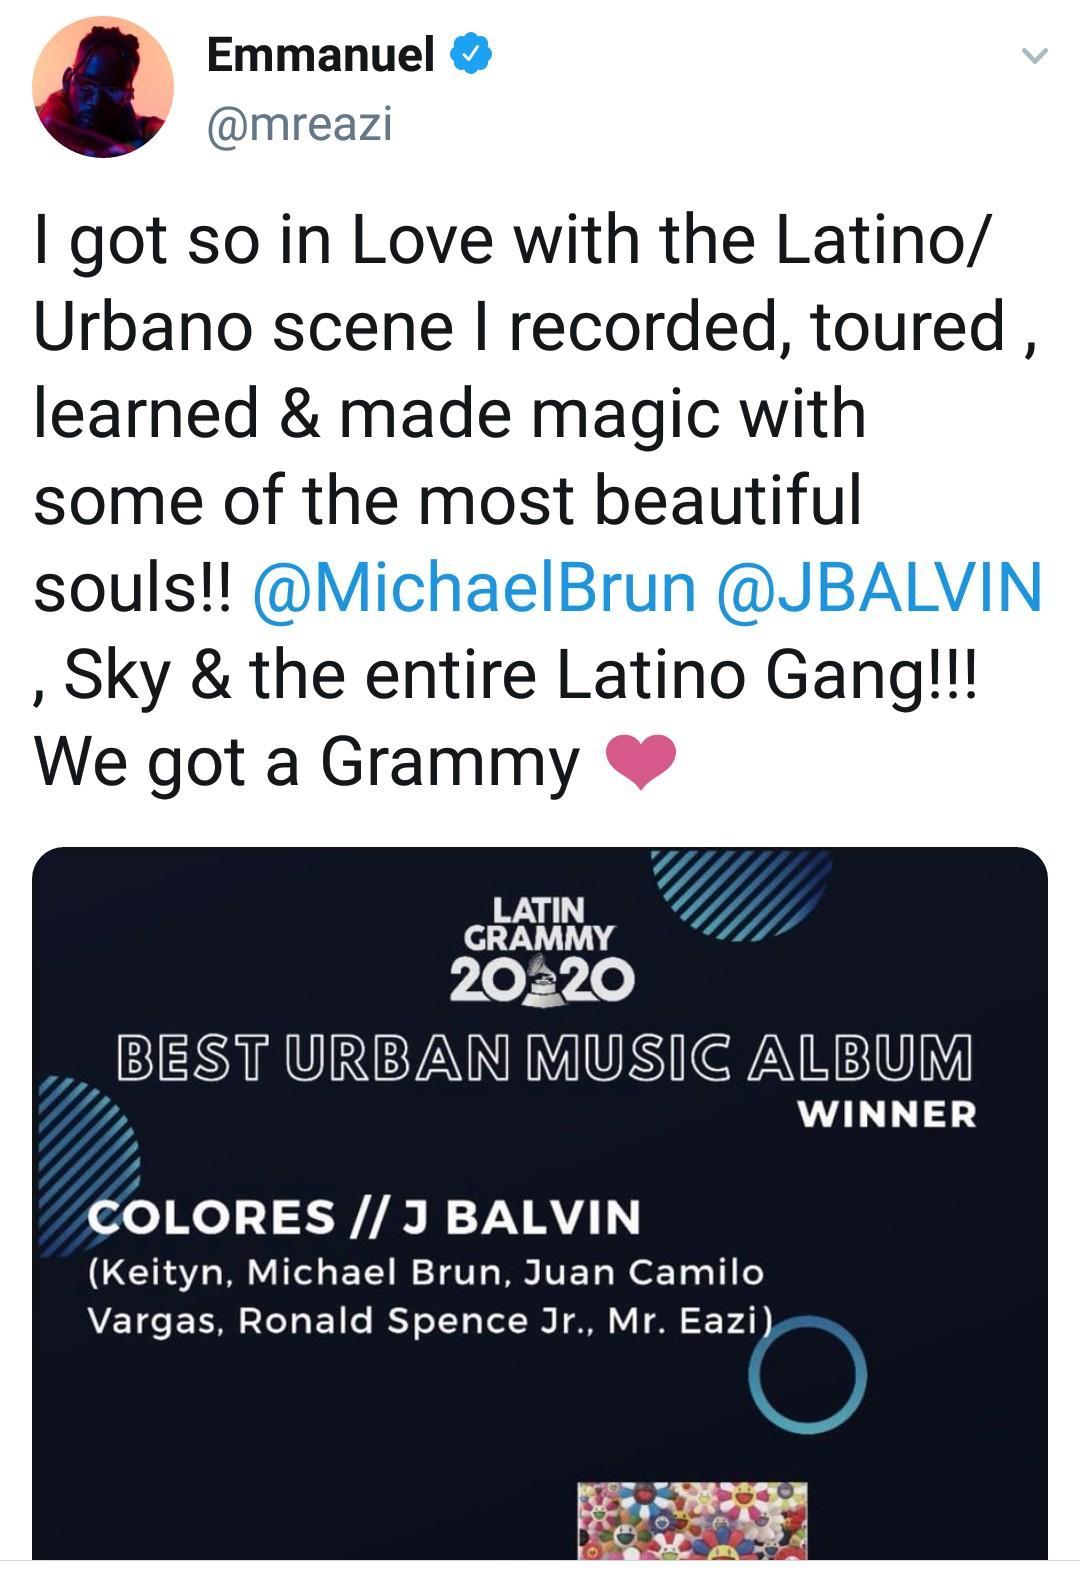 Nigerian Singer, Mr Eazi Wins Best Urban Music Album in 2020 Latin Grammy Award - Tatahfonewsarena